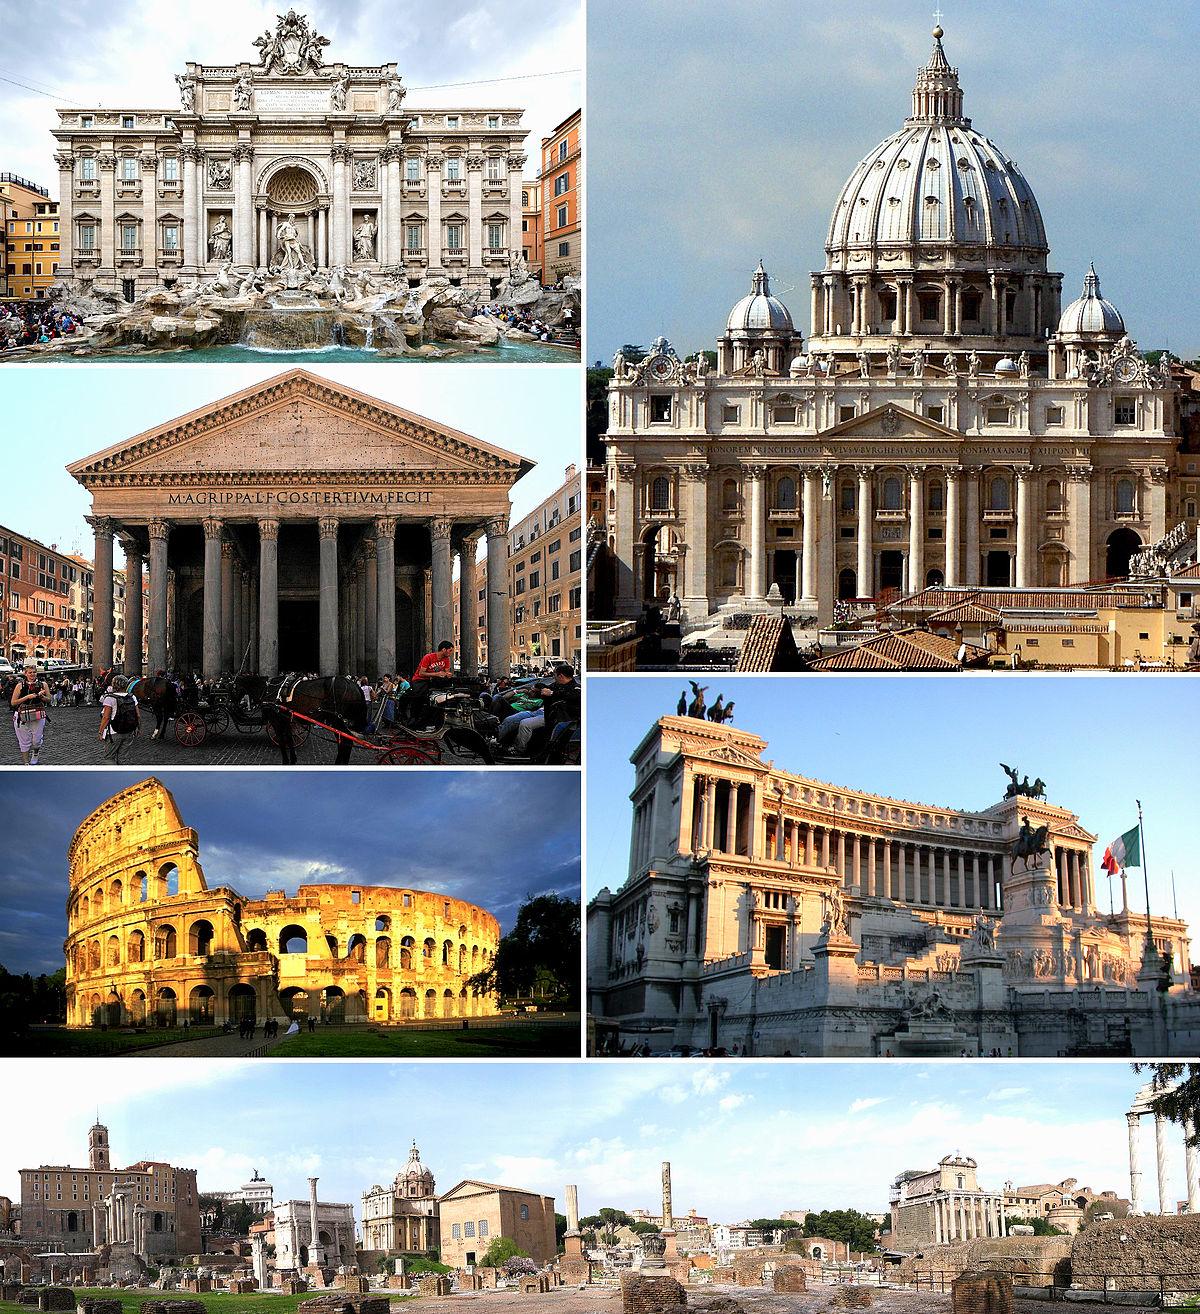 roma surrectumroma aeterna, roma fc, roma hotel, roma pass, roma acorn, roma termini, roma italia, рома и диана, roma smile, roma kenga, roma tiburtina, roma reqemleri, roma surrectum, roma bangkok, roma antica, roma surrectum 3, roma invicta, roma show, roma fashion week, roma smile аккорды